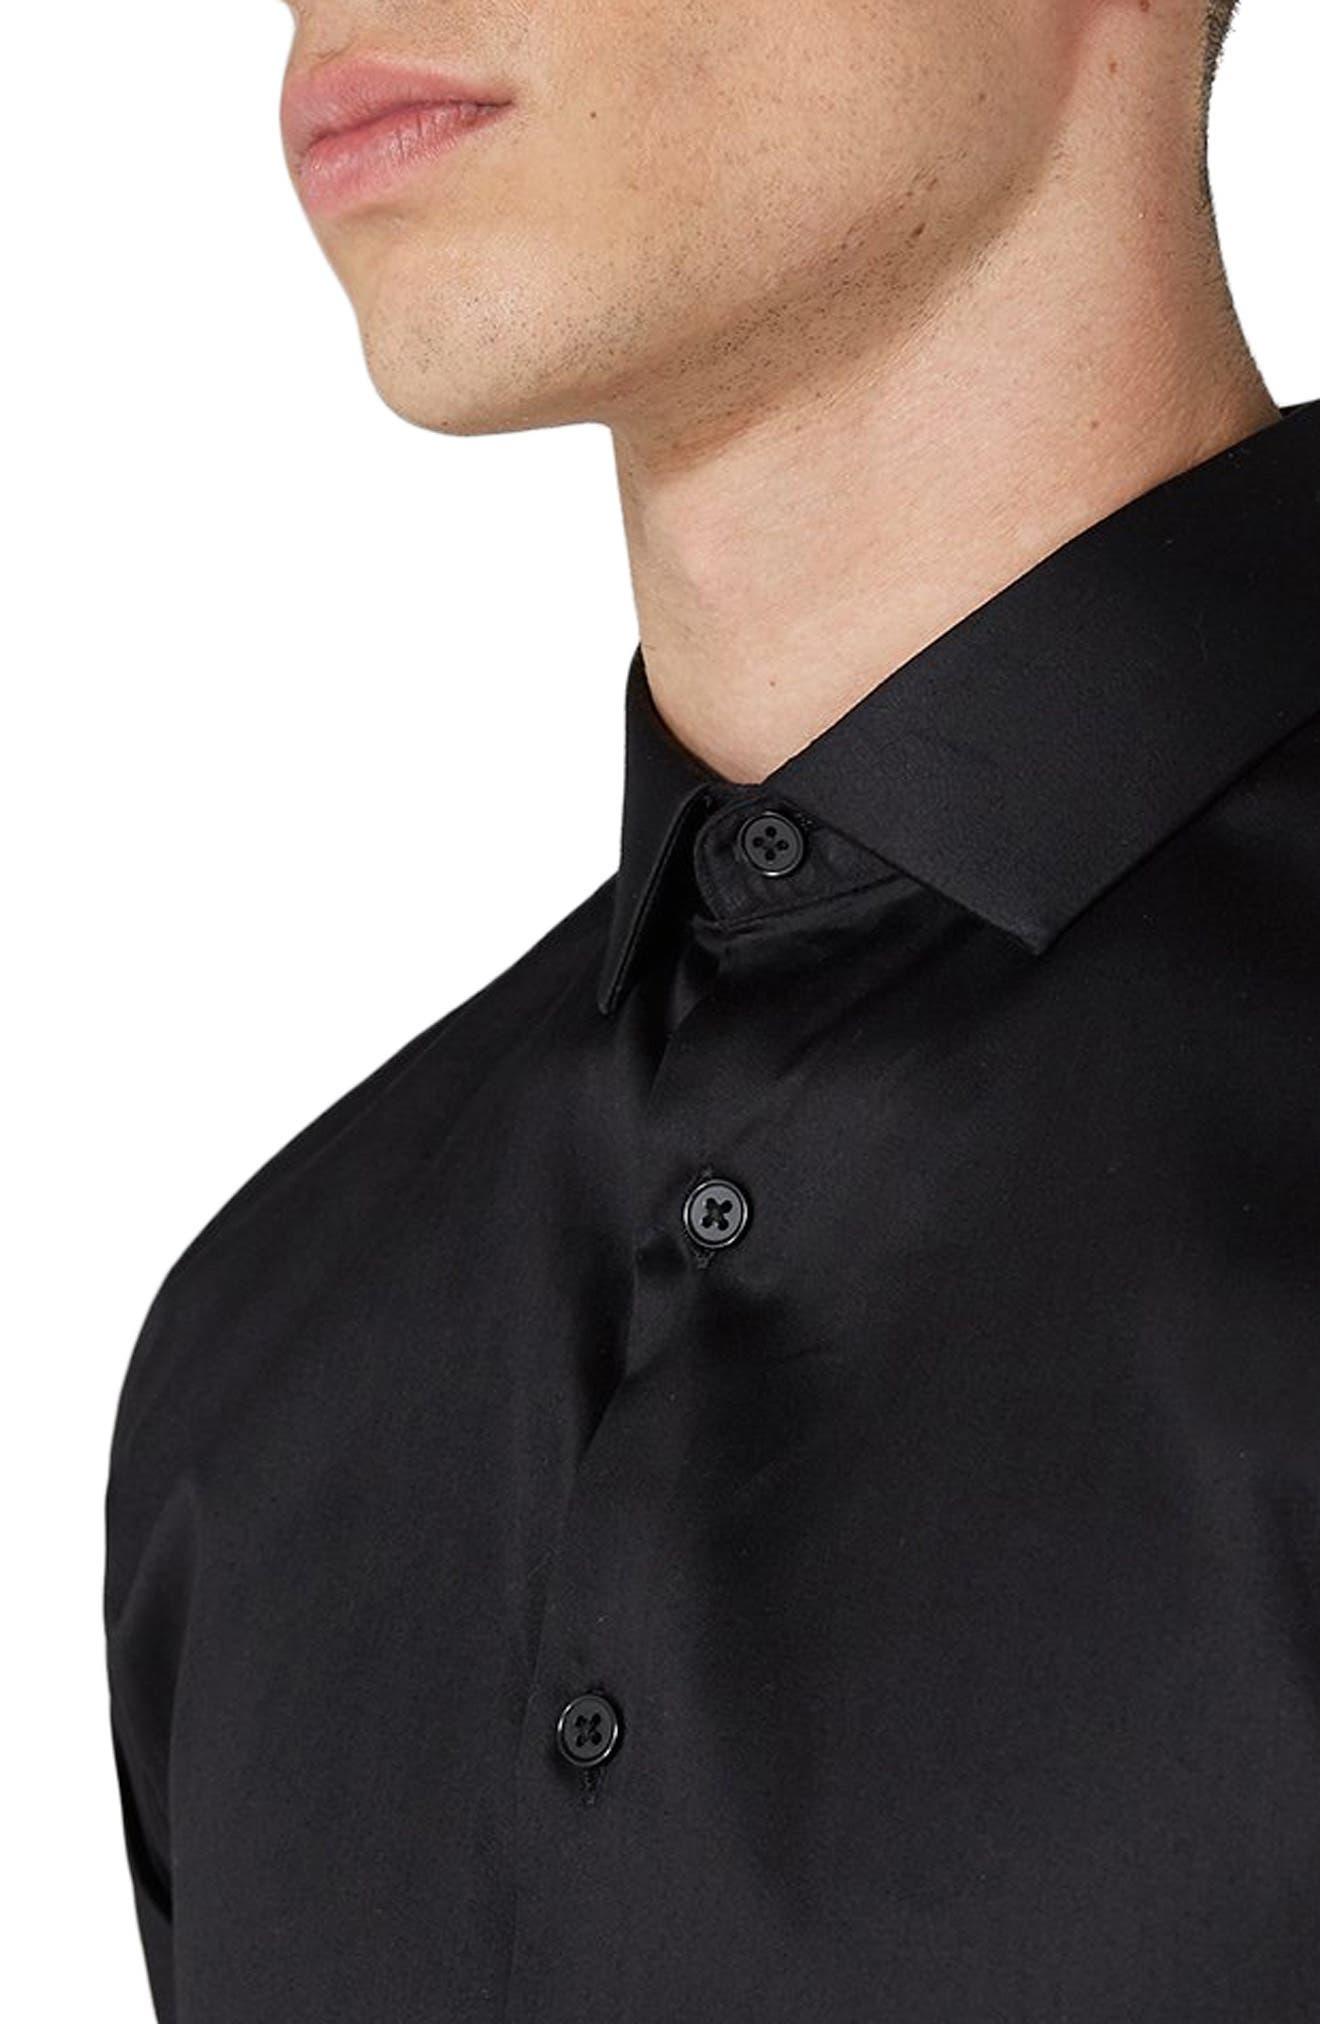 Muscle Fit Satin Shirt,                             Alternate thumbnail 2, color,                             BLACK